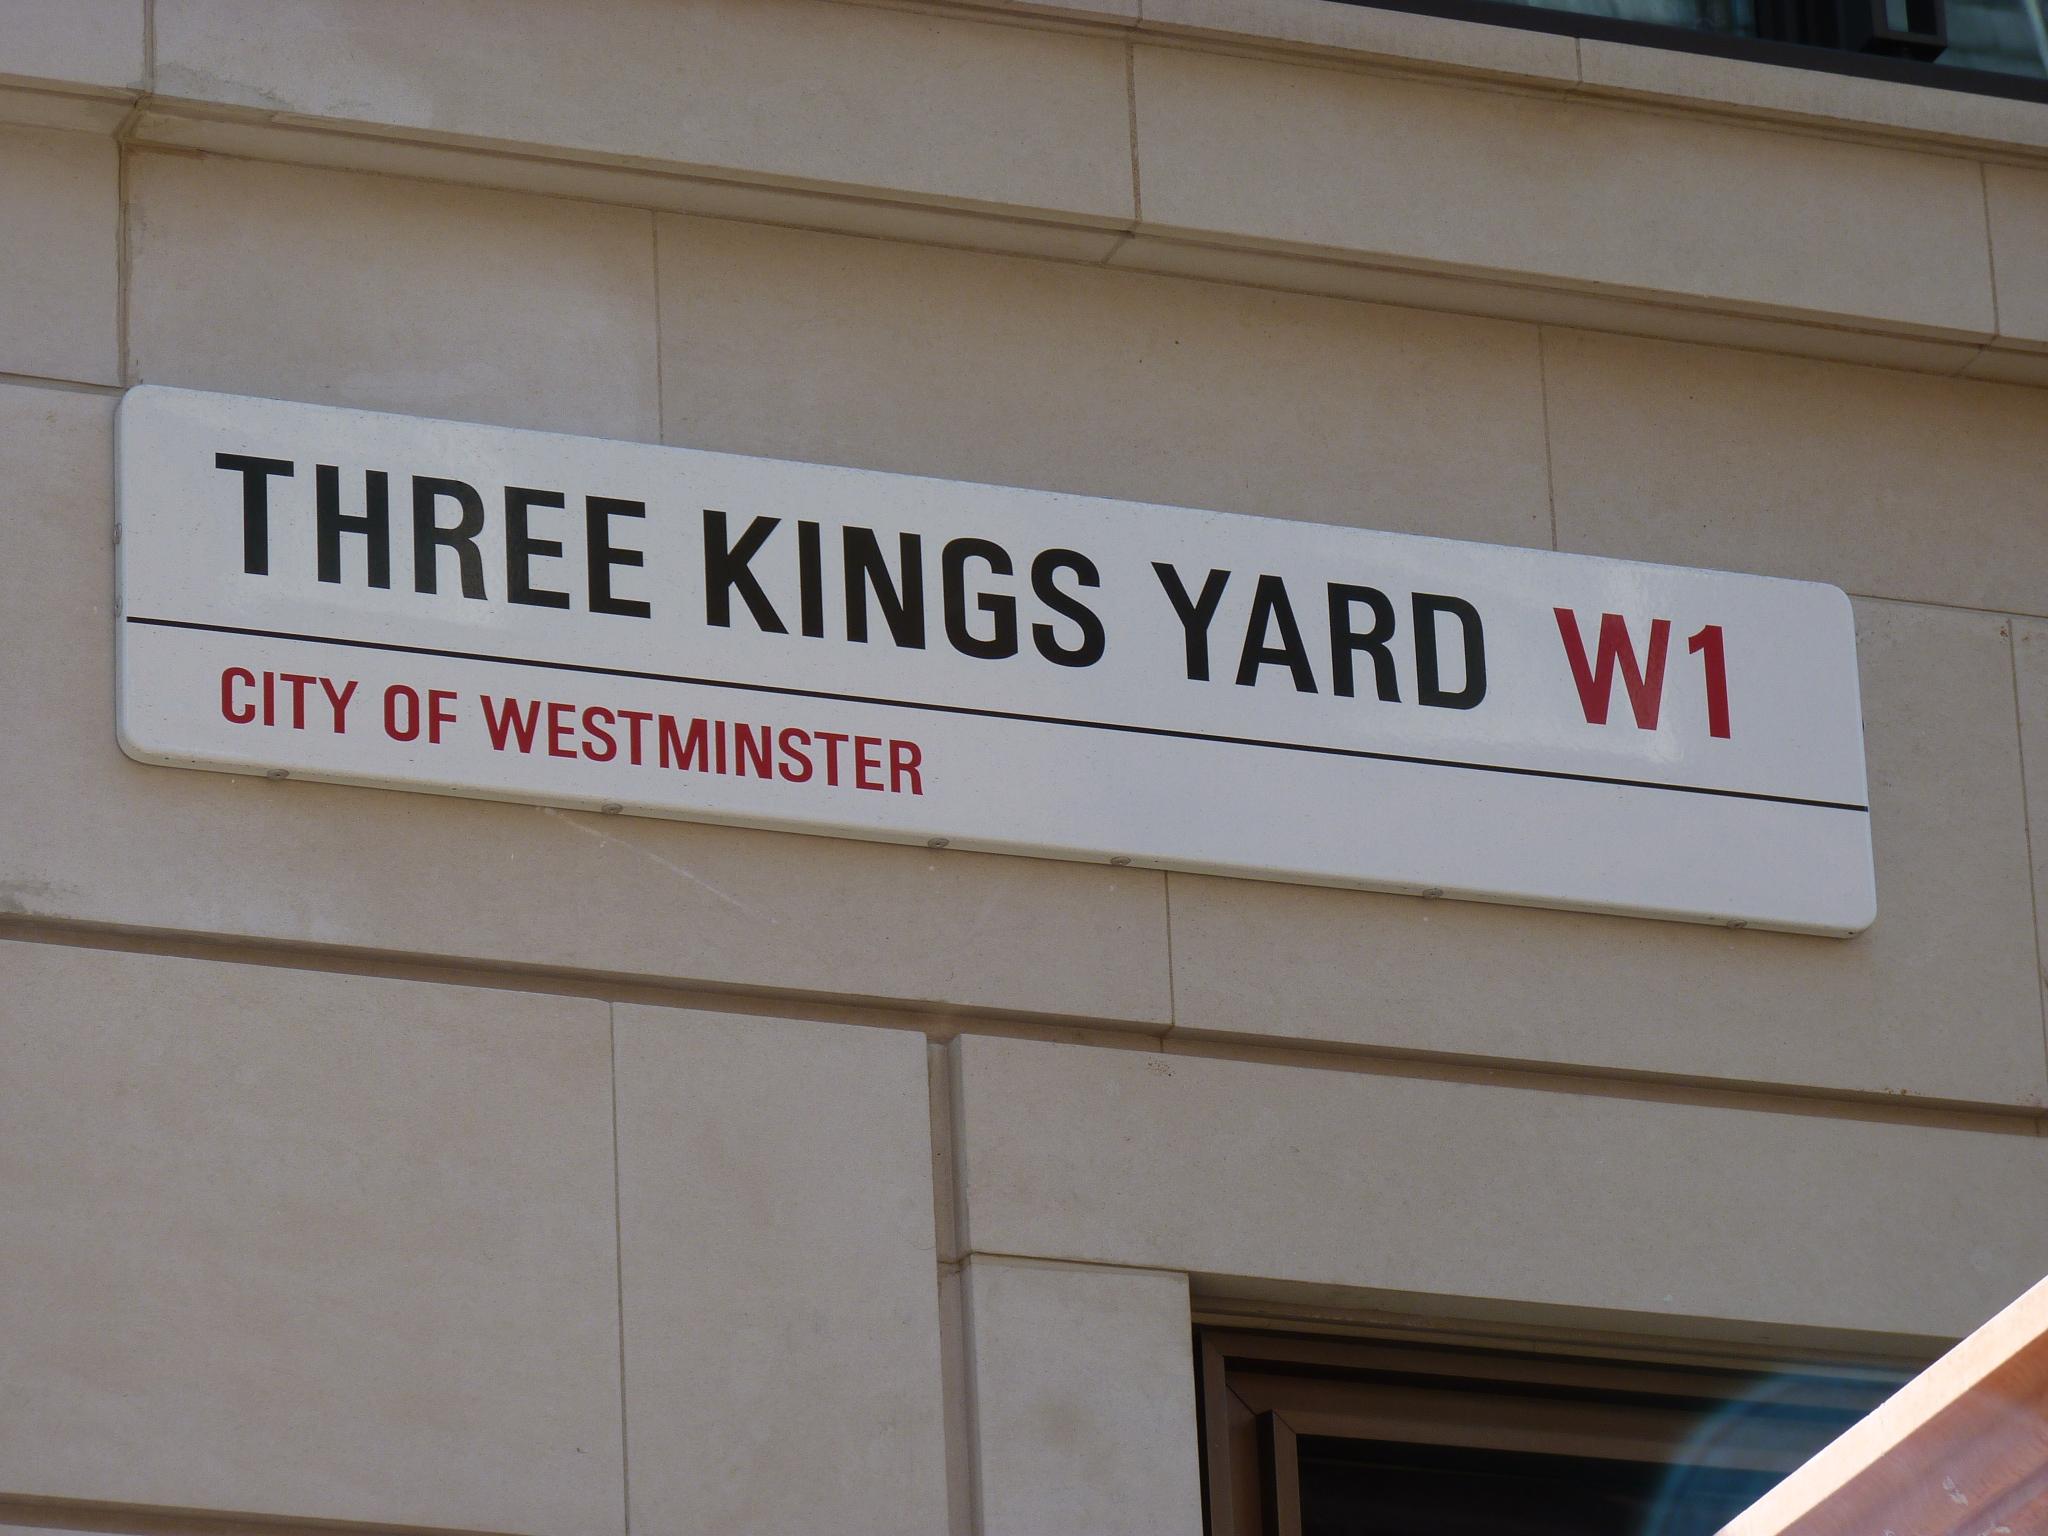 Three Kings Yard, London Street Signage - City of Westminster